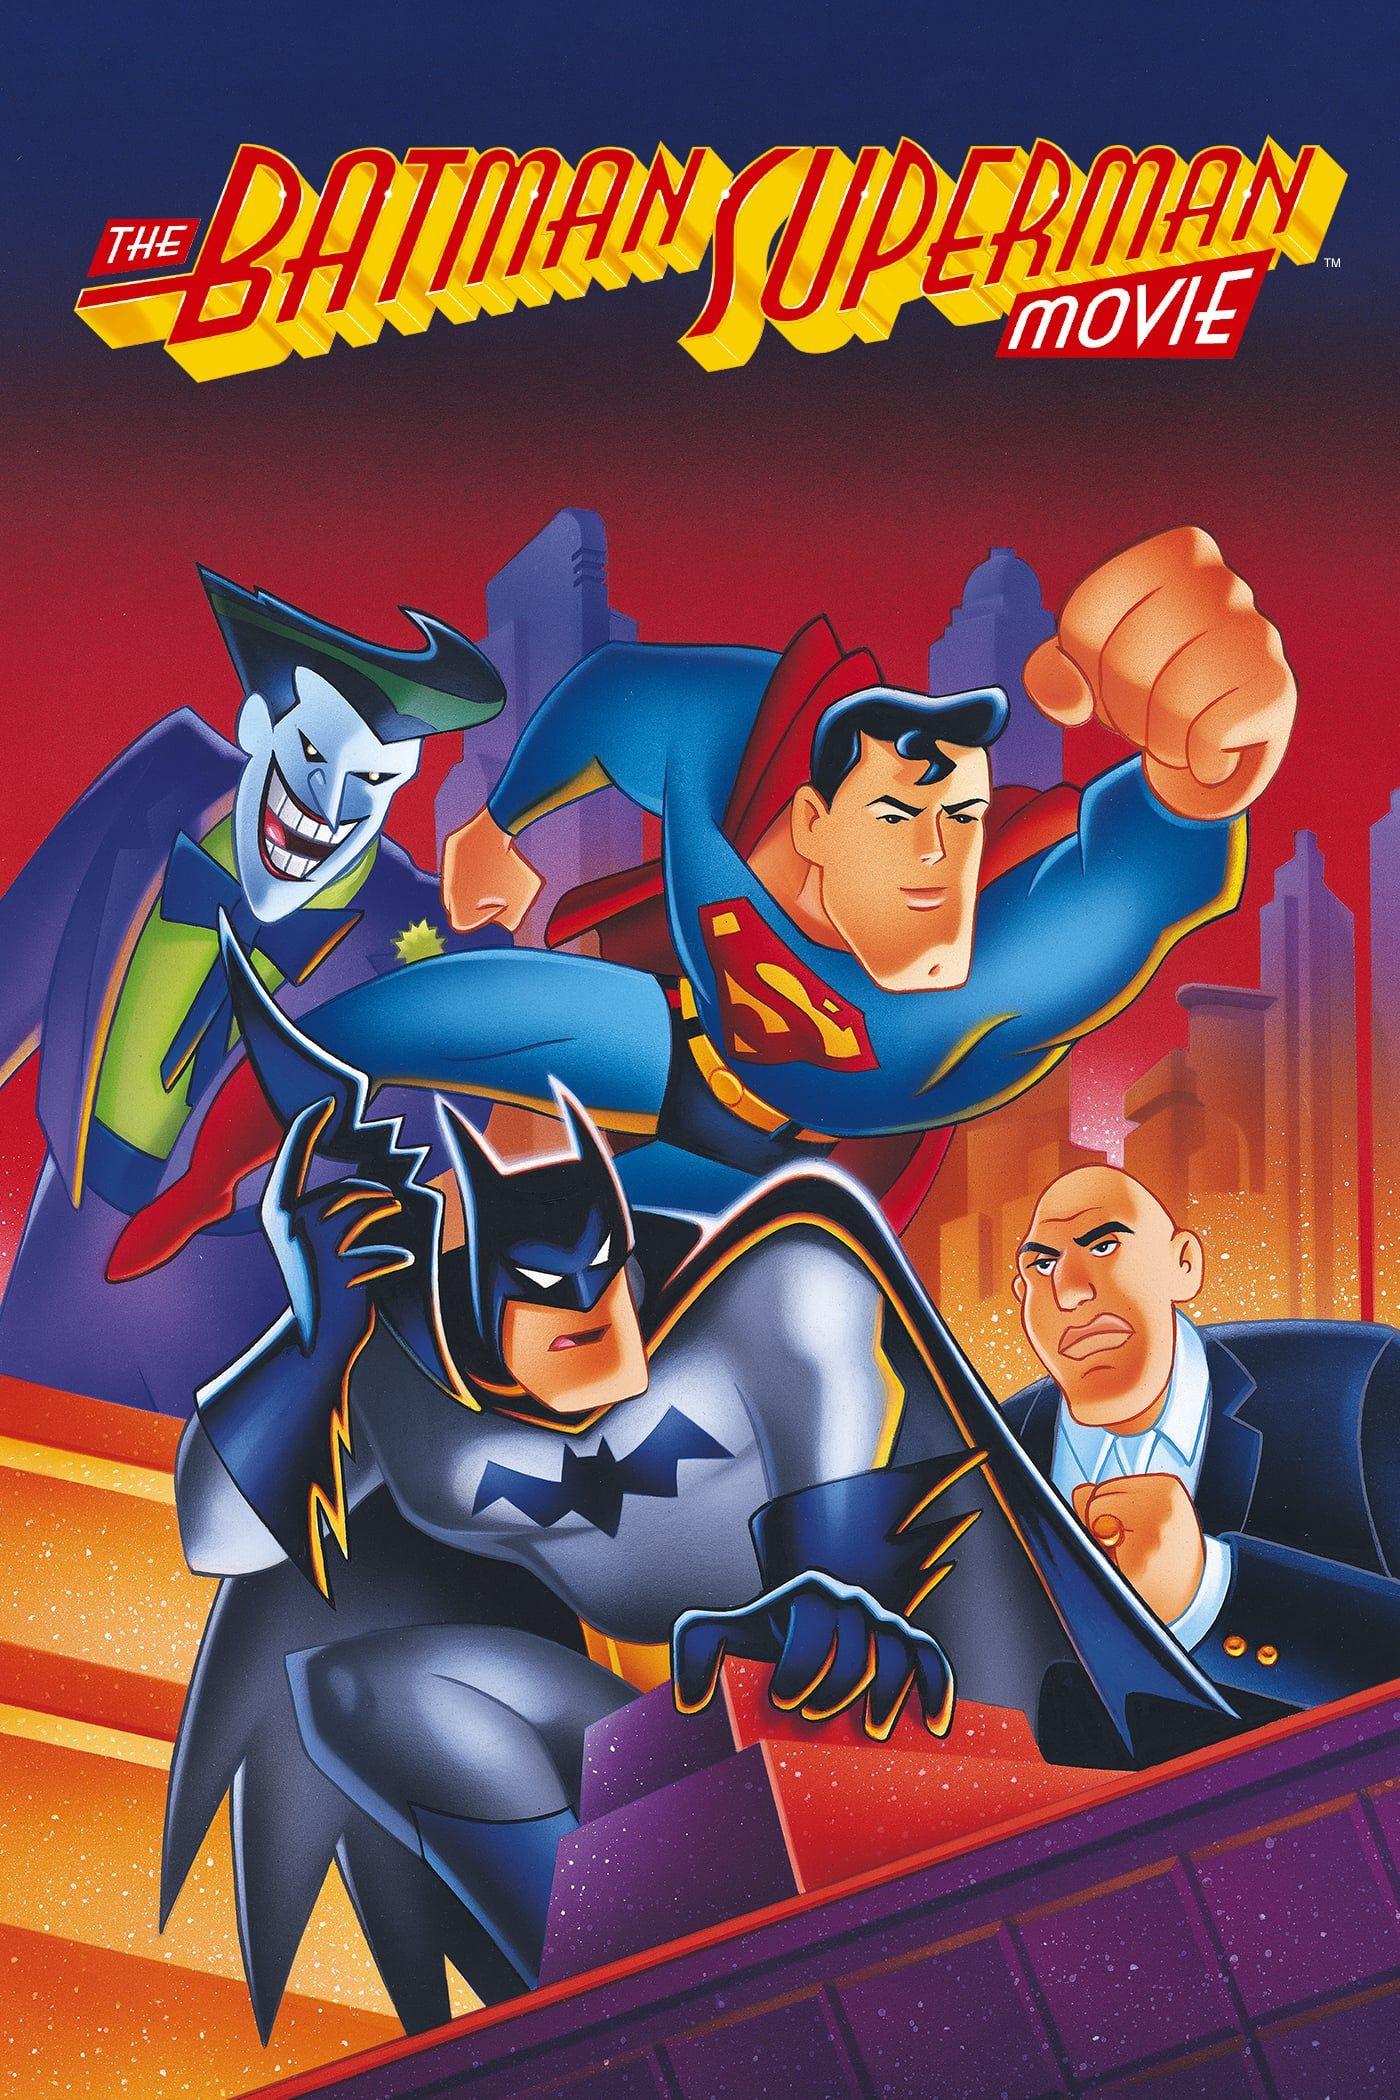 Descargar The Batman Superman Movie World S Finest 1998 Pelicula Completa Ver Hd Espanol The Batman Superman Movie Superman Movies Batman And Superman